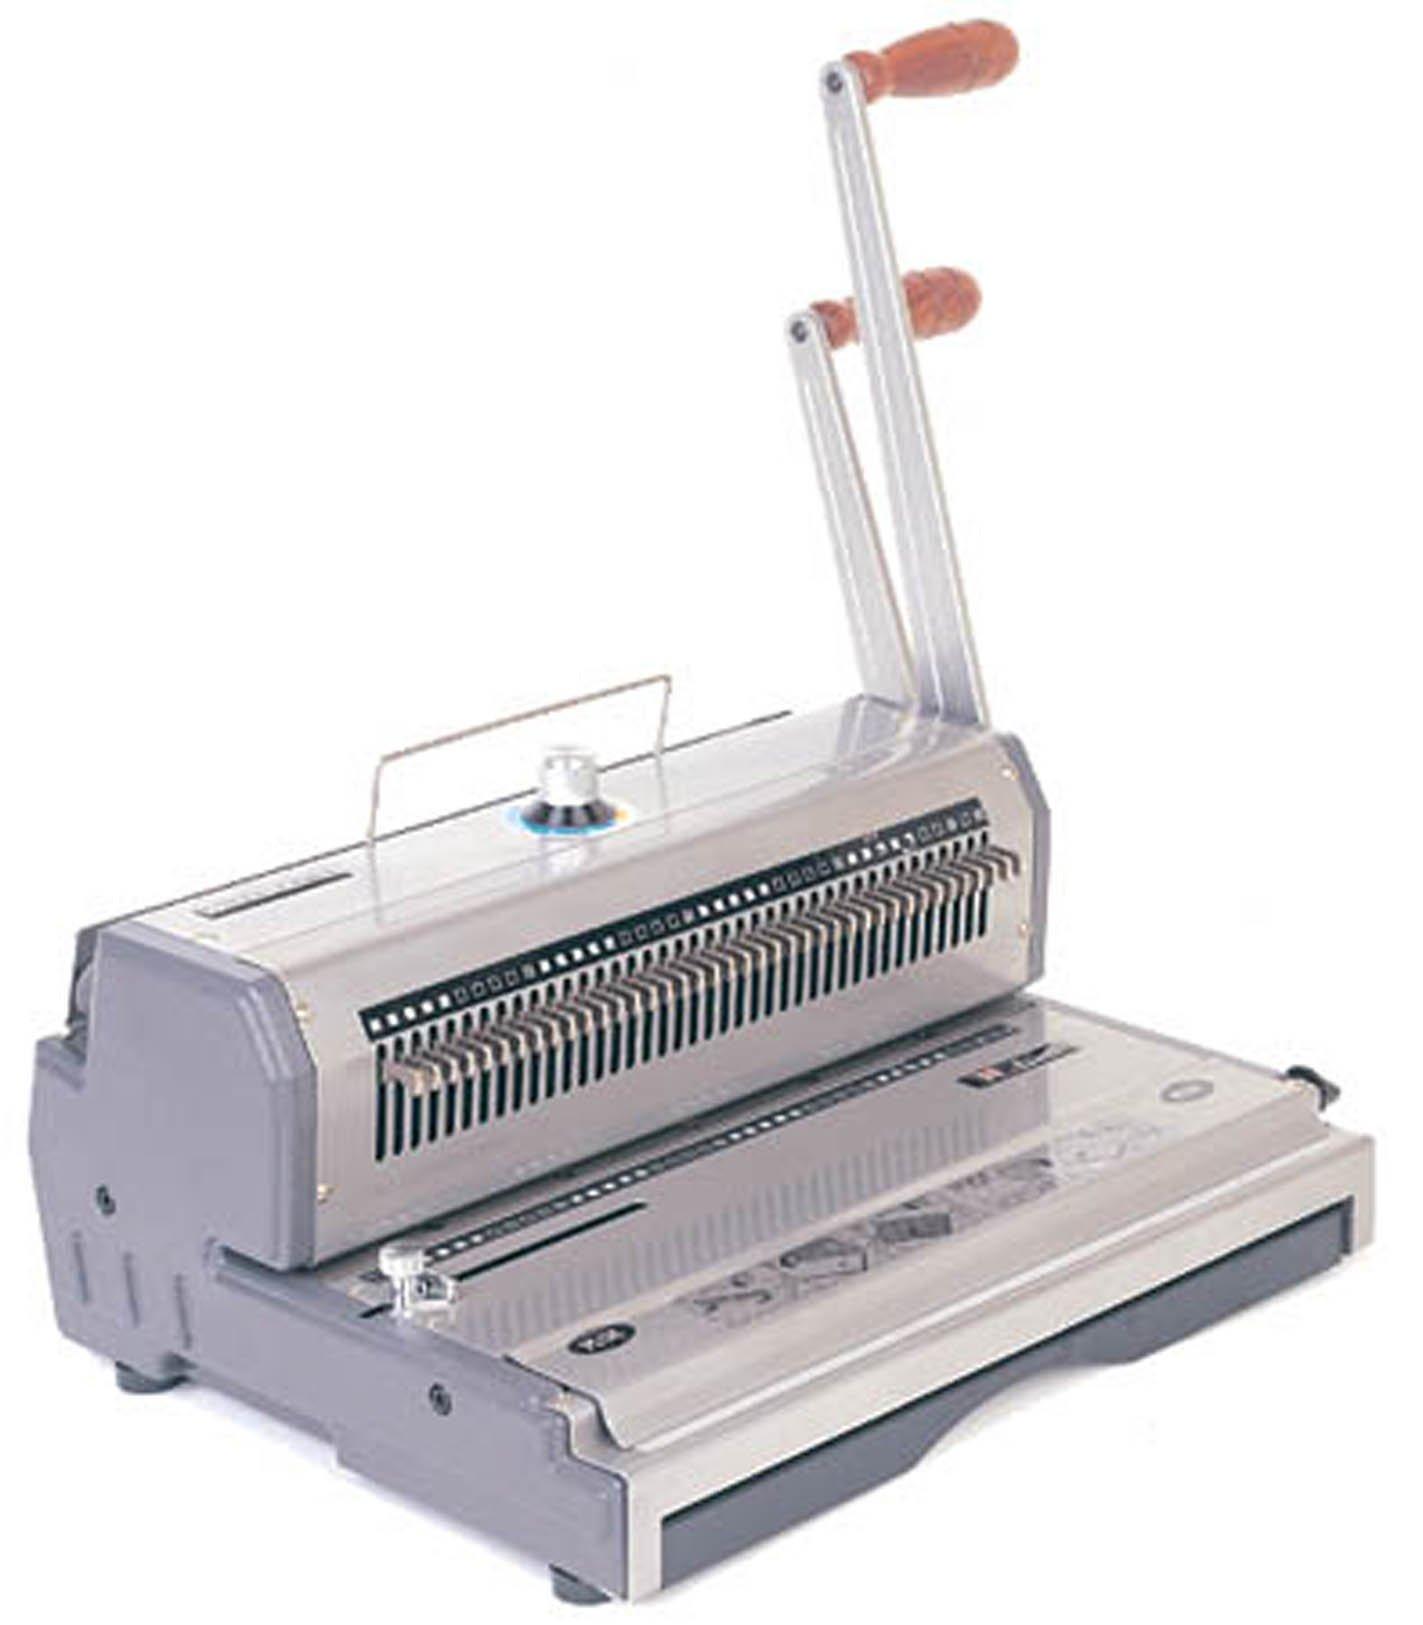 Akiles Wiremac-21 14'' 2:1 Pitch Wire Binding Machine & Punch